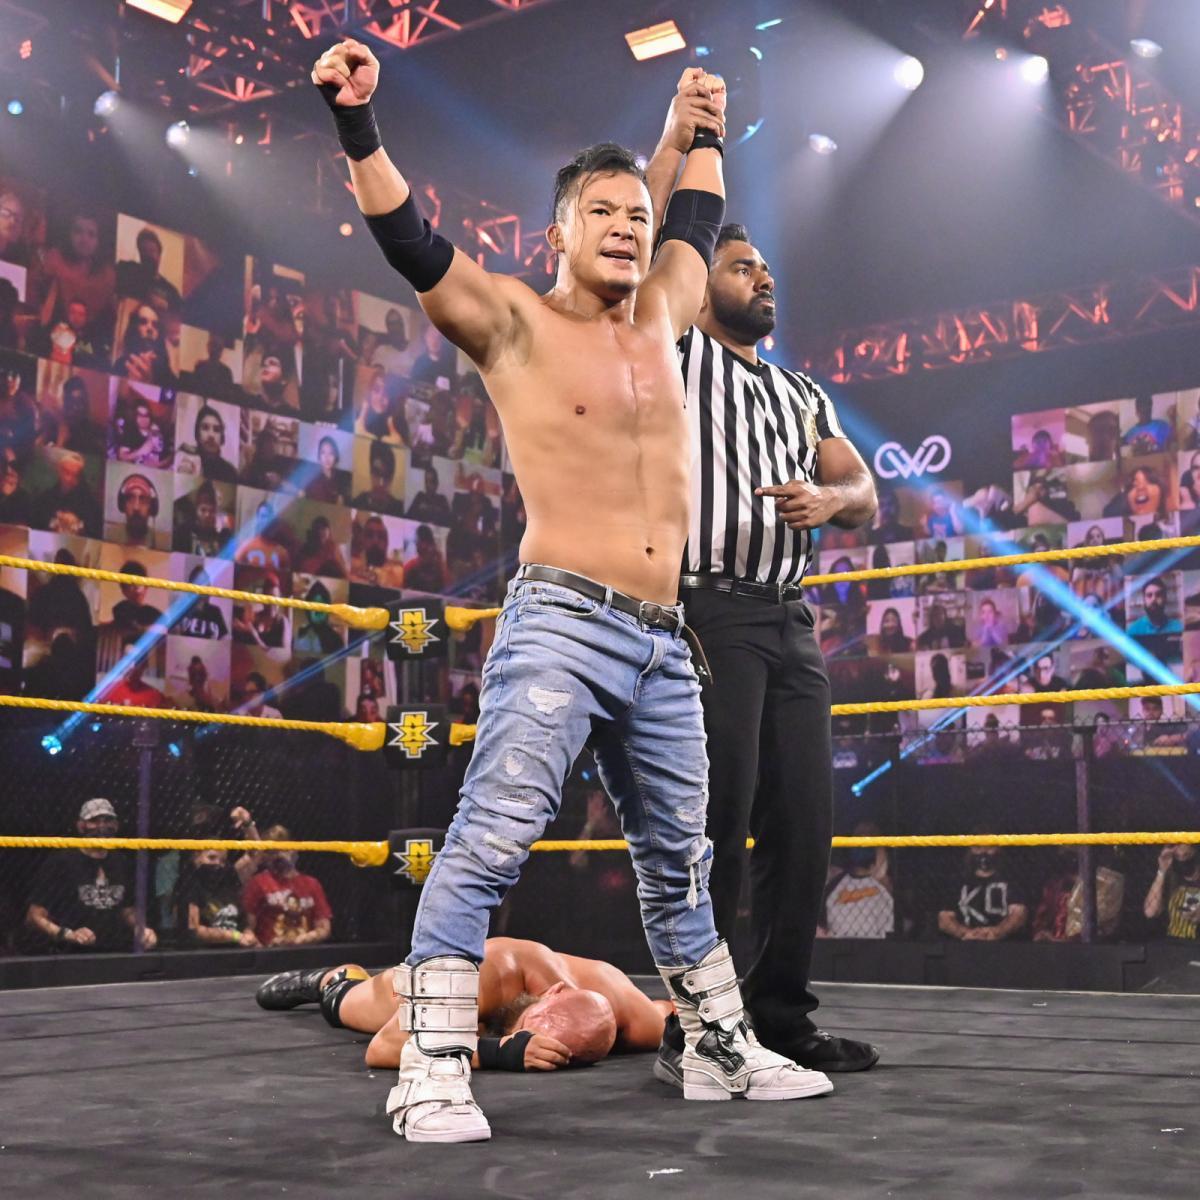 WWEクルーザー級王座を獲得したKUSHIDA(C)2021 WWE, Inc. All Rights Reserved.